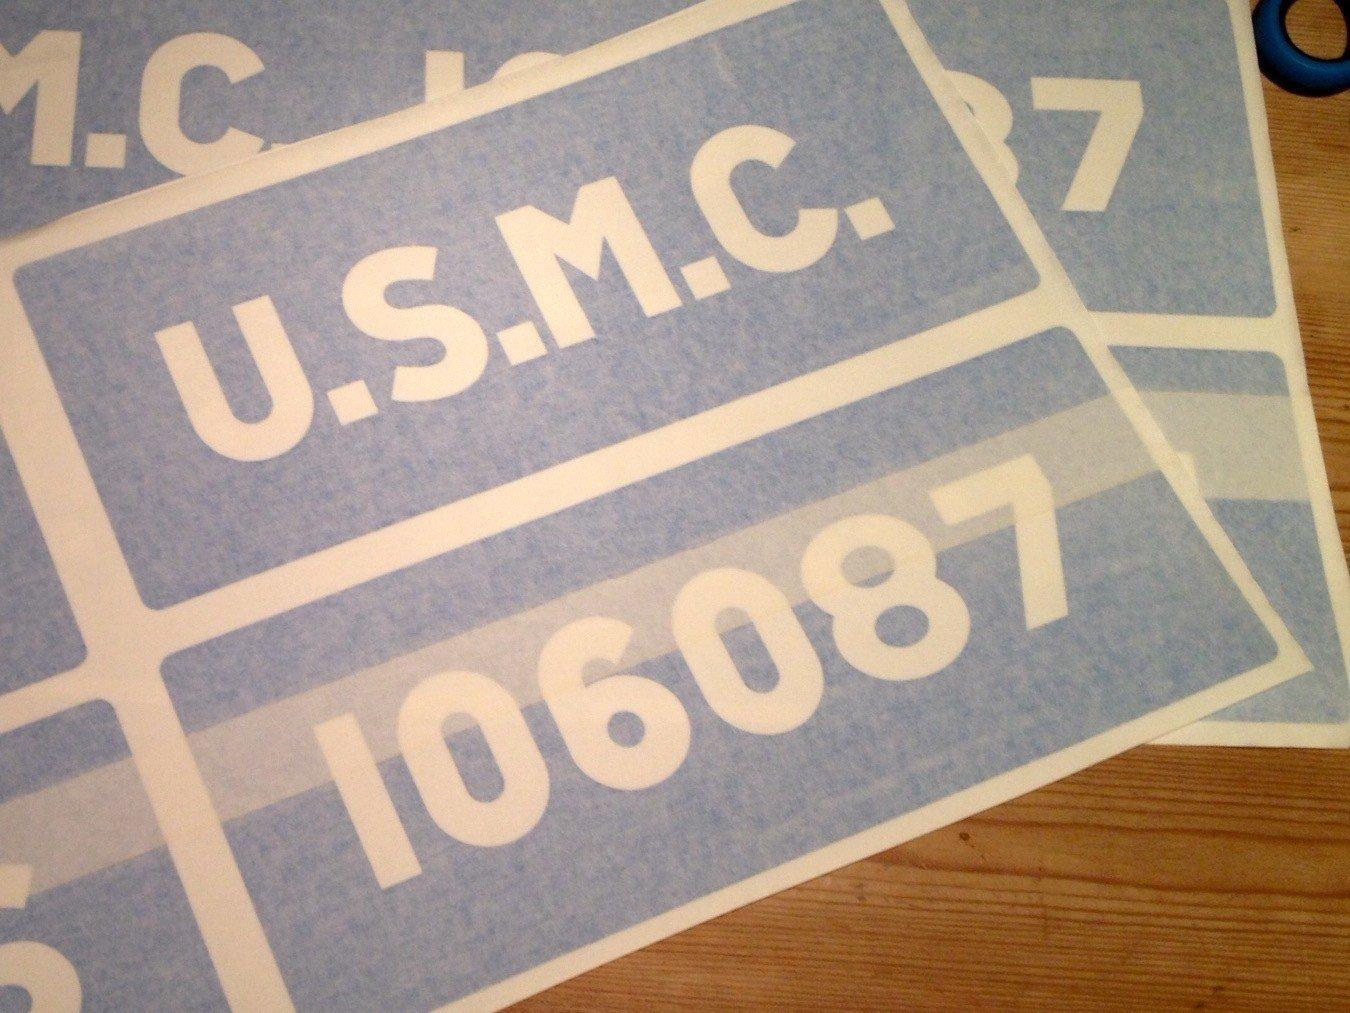 Factory font side of tub U.S.M.C. stencils for Jeep ww2 army